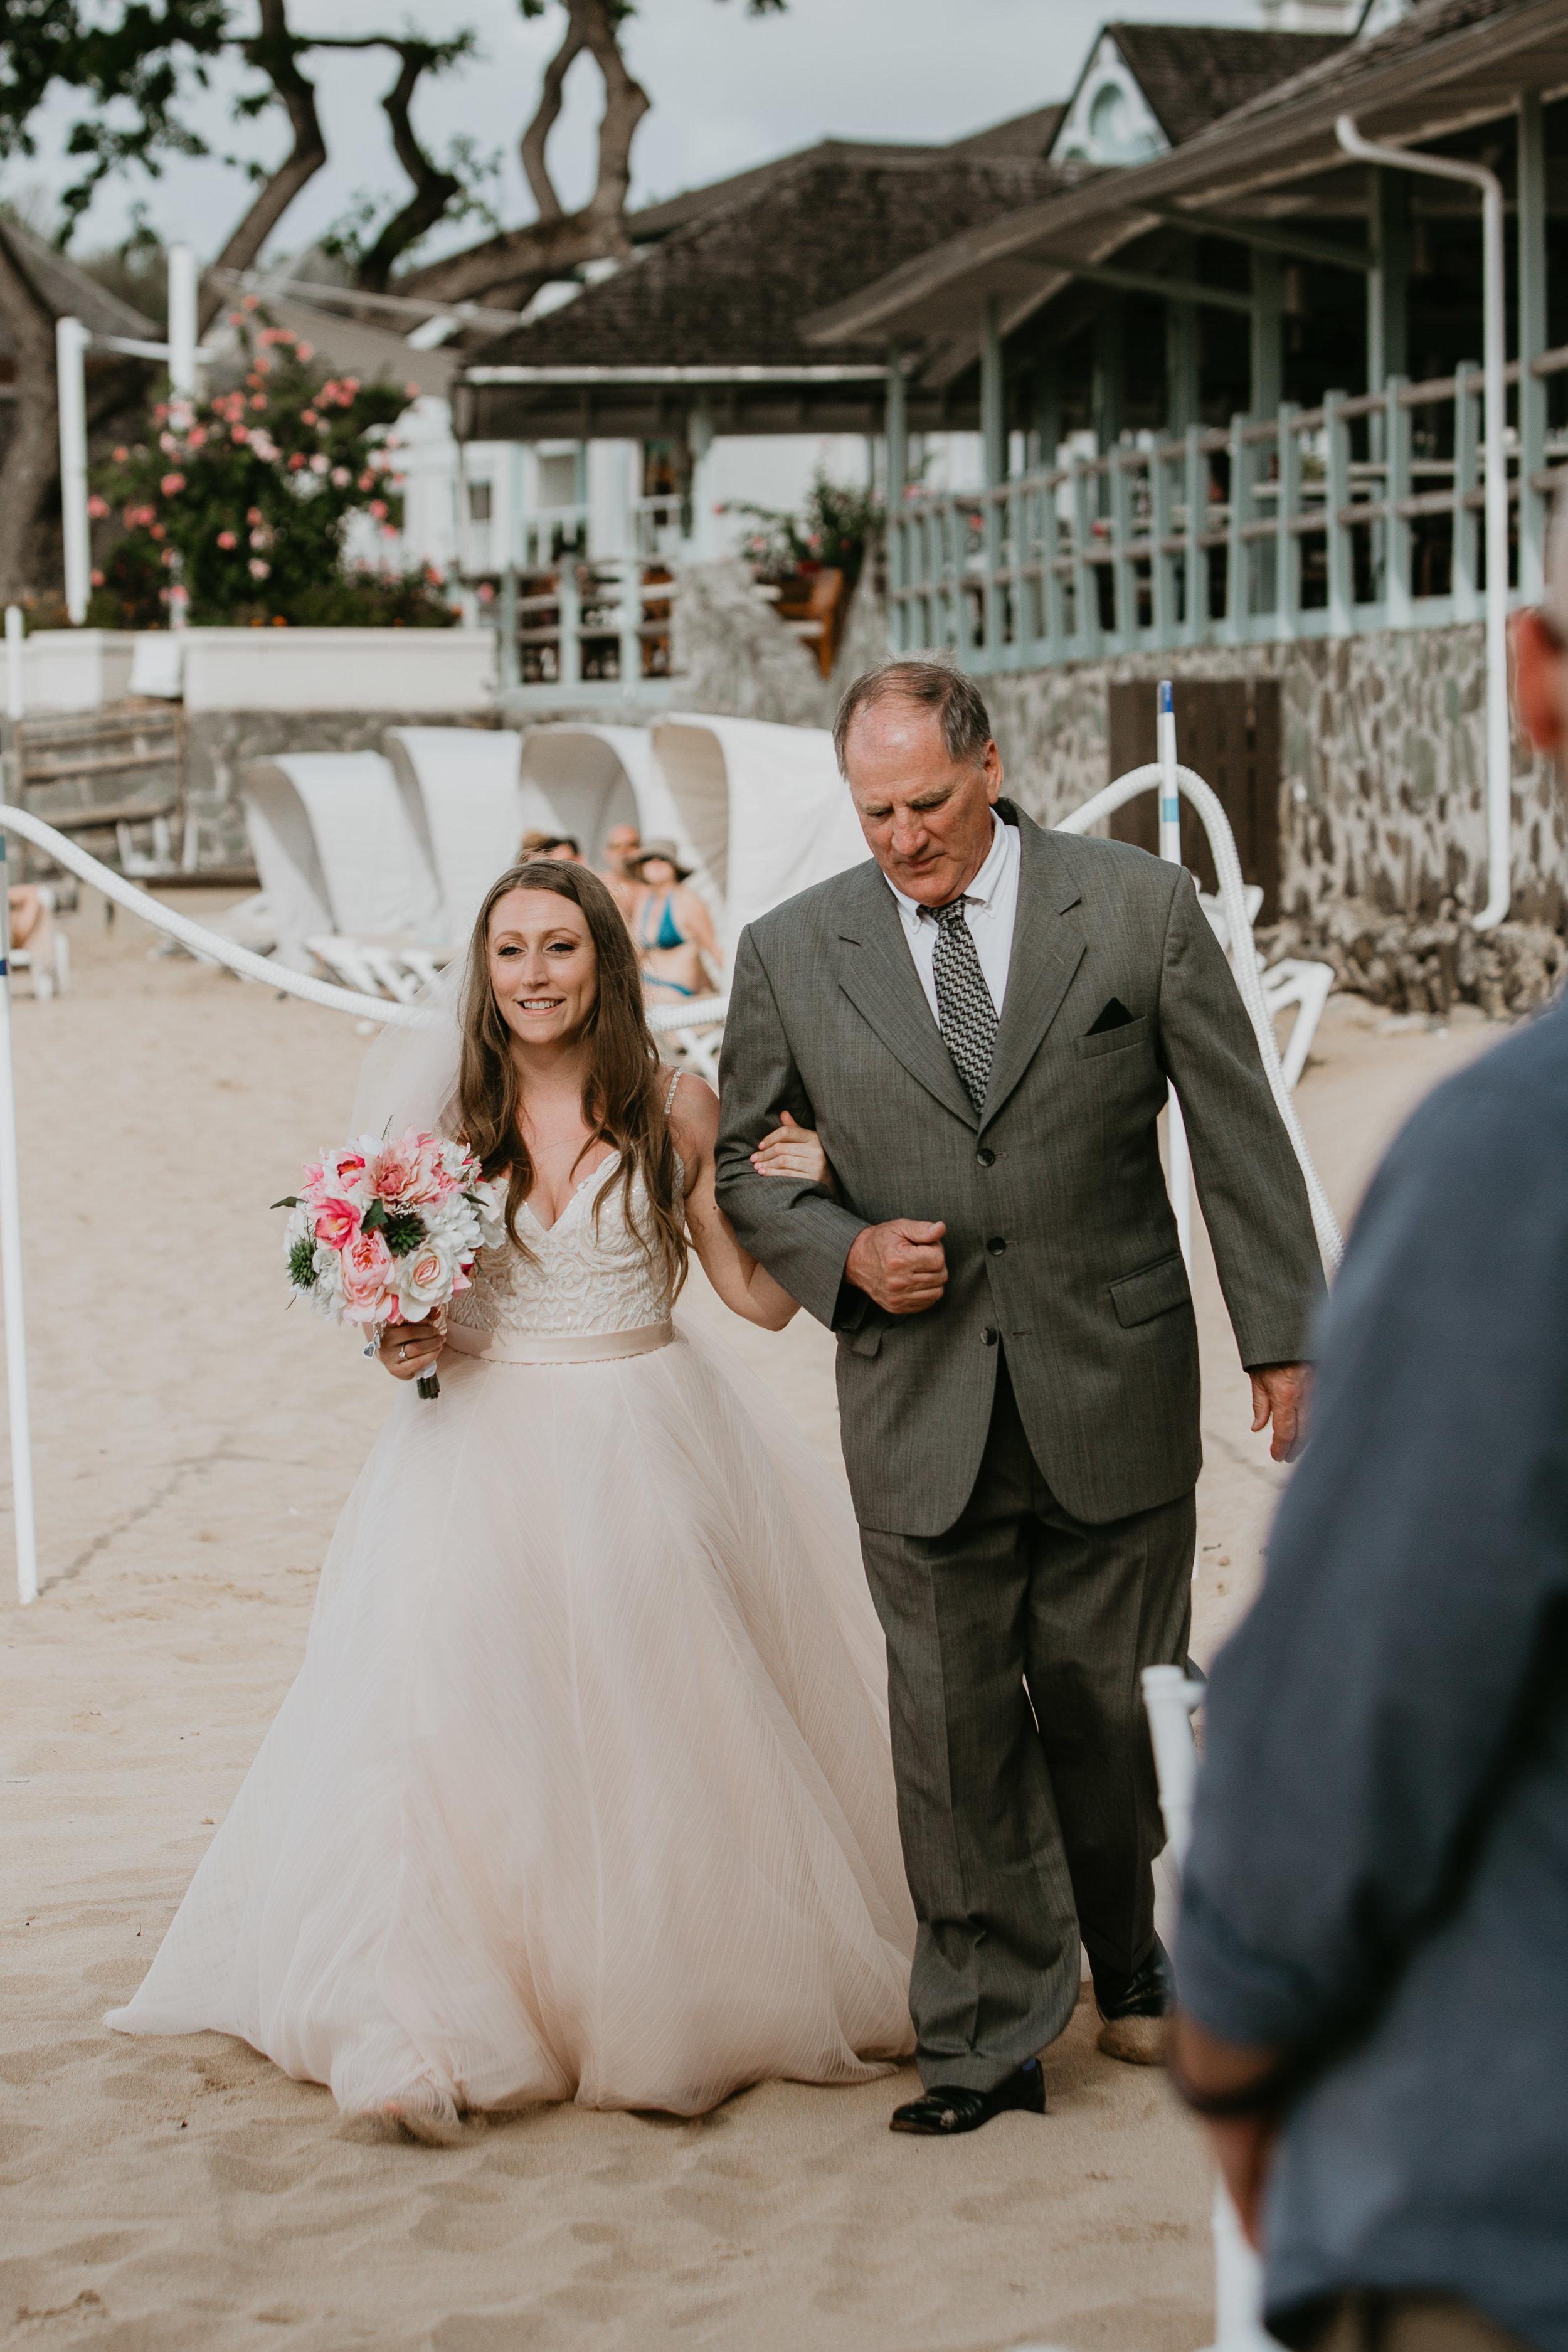 nicole-daacke-photography-destination-wedding-in-st-lucia-sandals-la-toc-intimate-island-wedding-carribean-elopement-photographer-chill-island-wedding-59.jpg